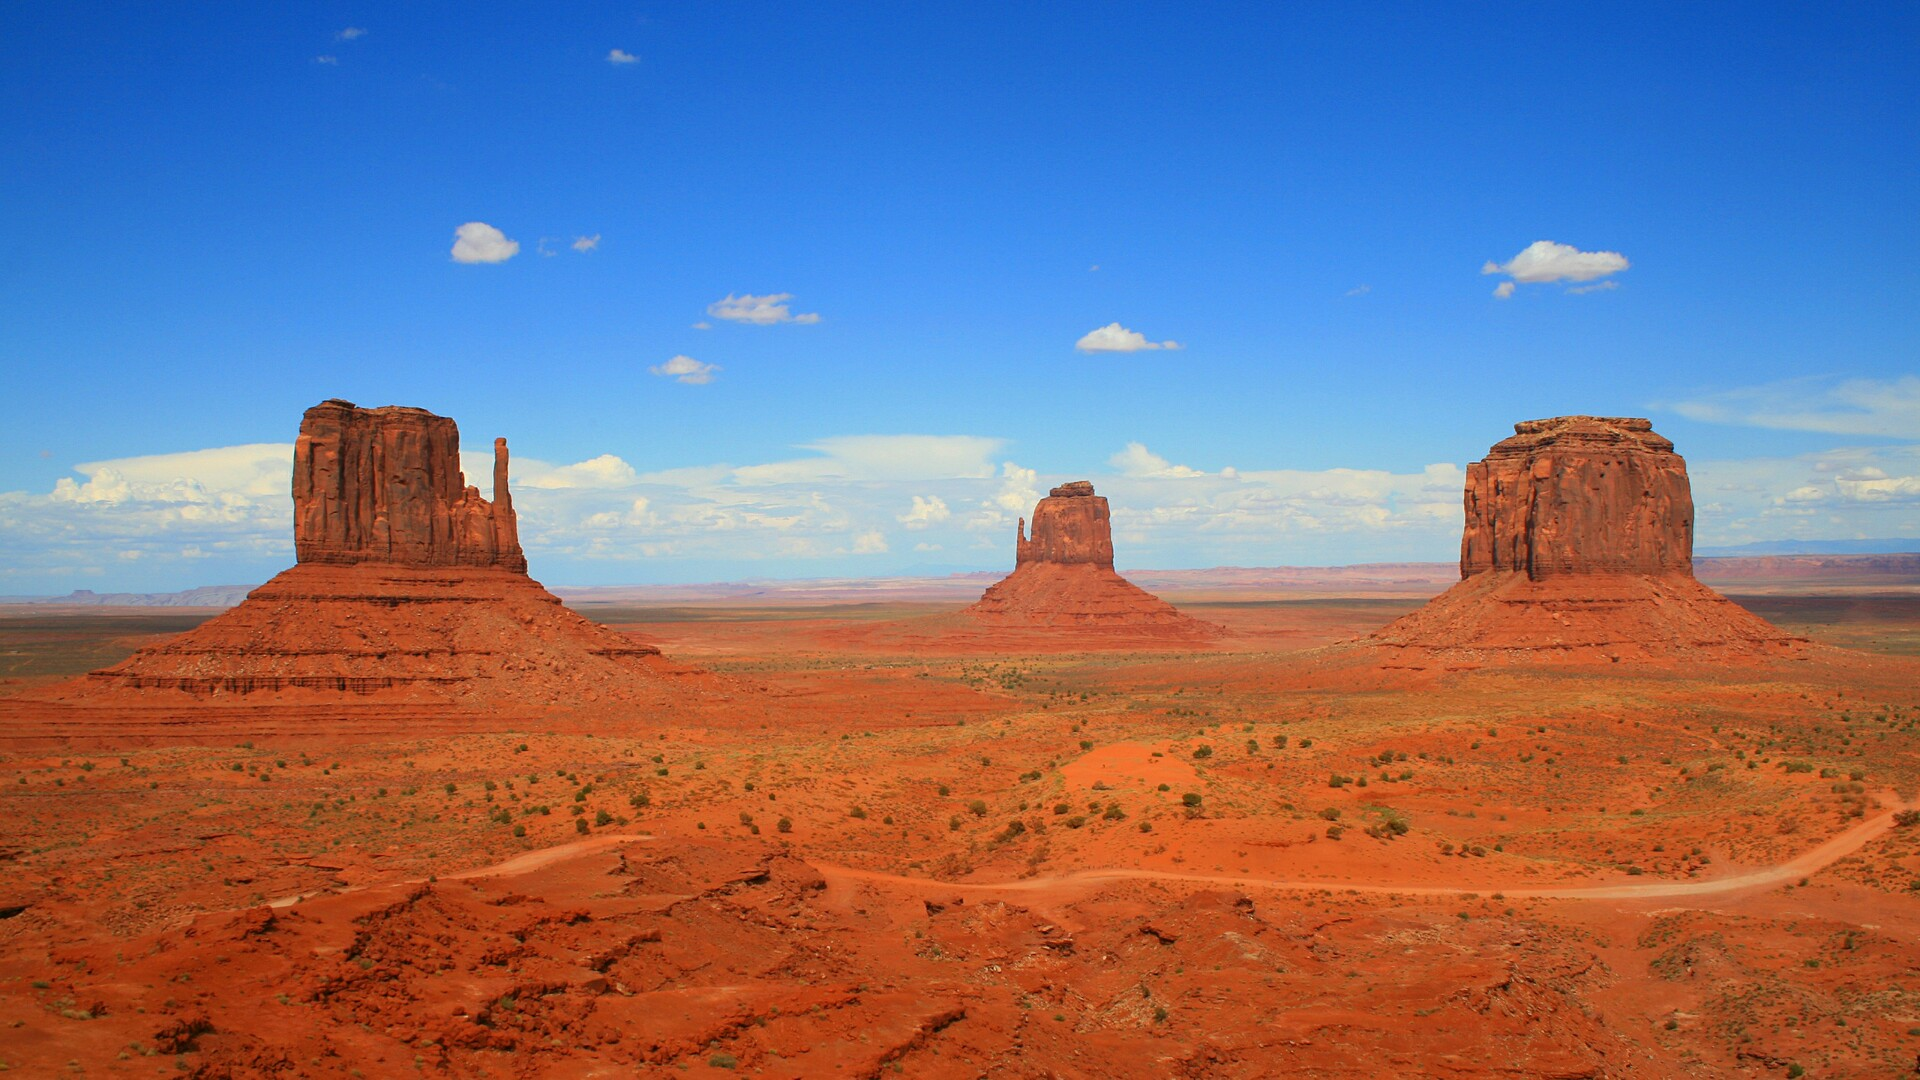 Monument Valley Navajo Tribal Park wallpaper